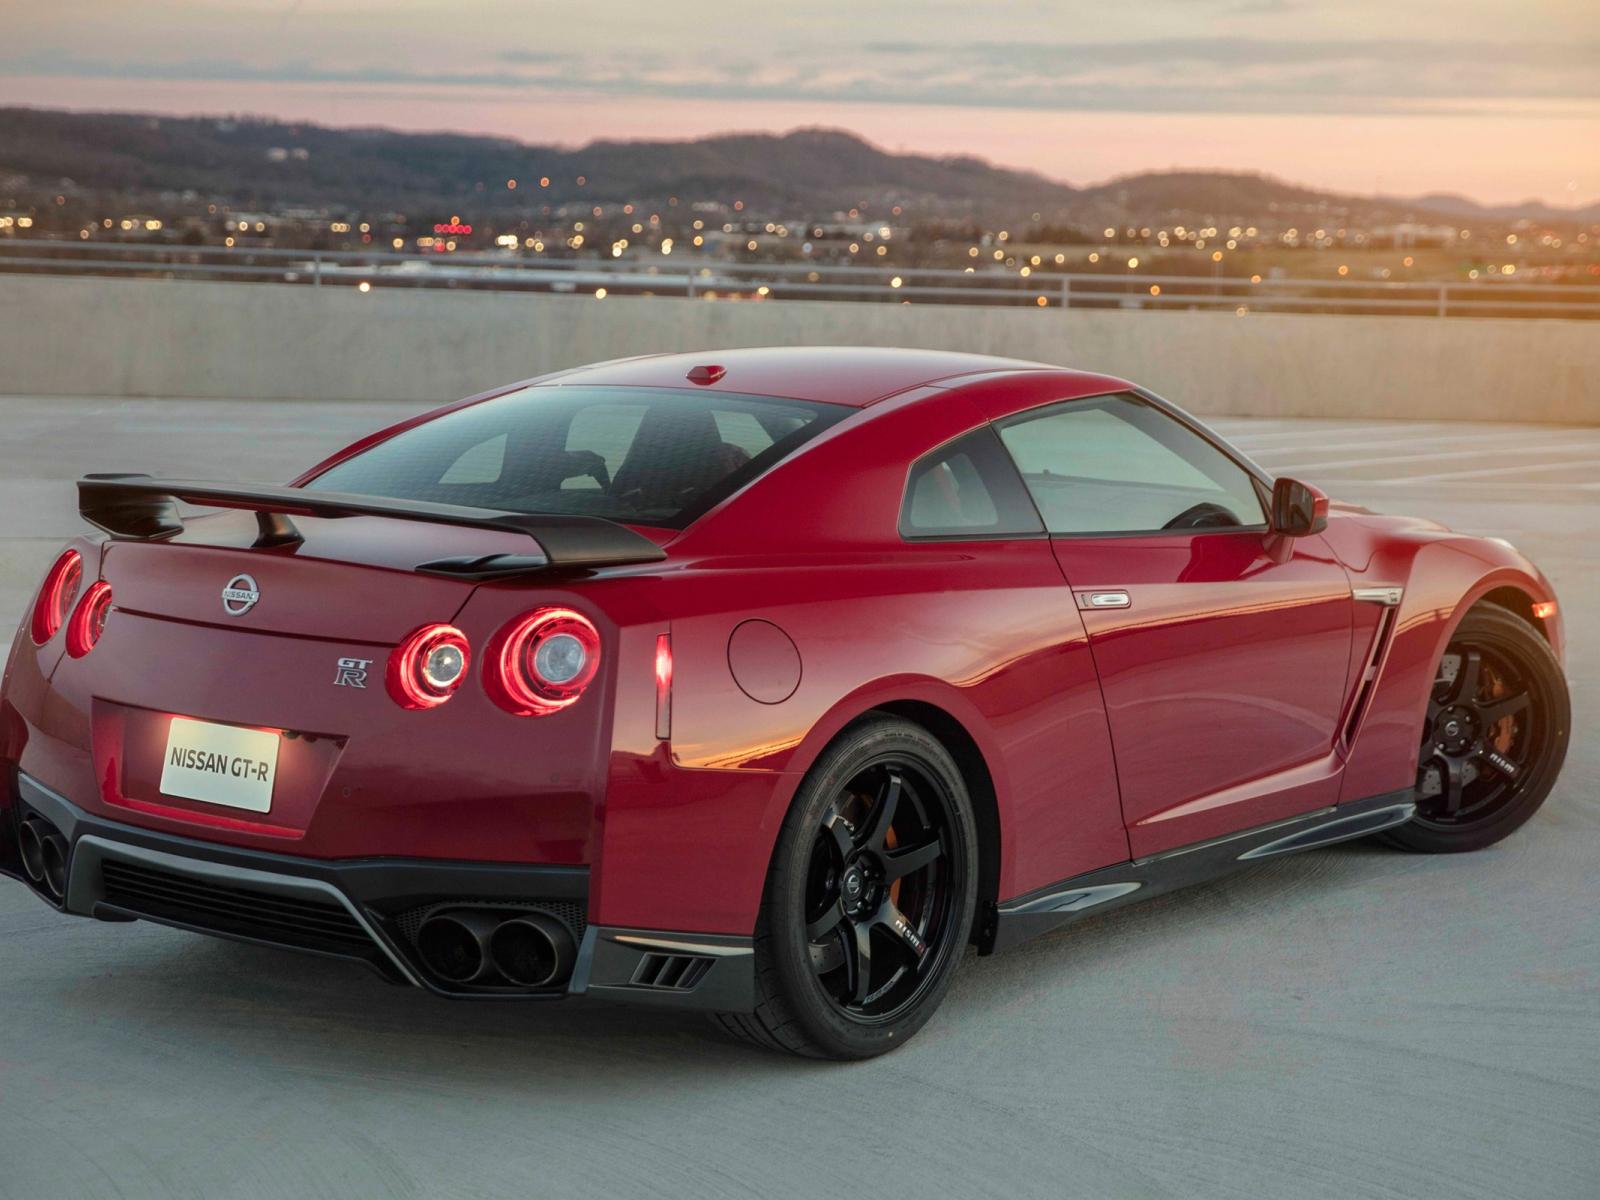 1600x1200 wallpaper Nissan GT-R, rear view, red car